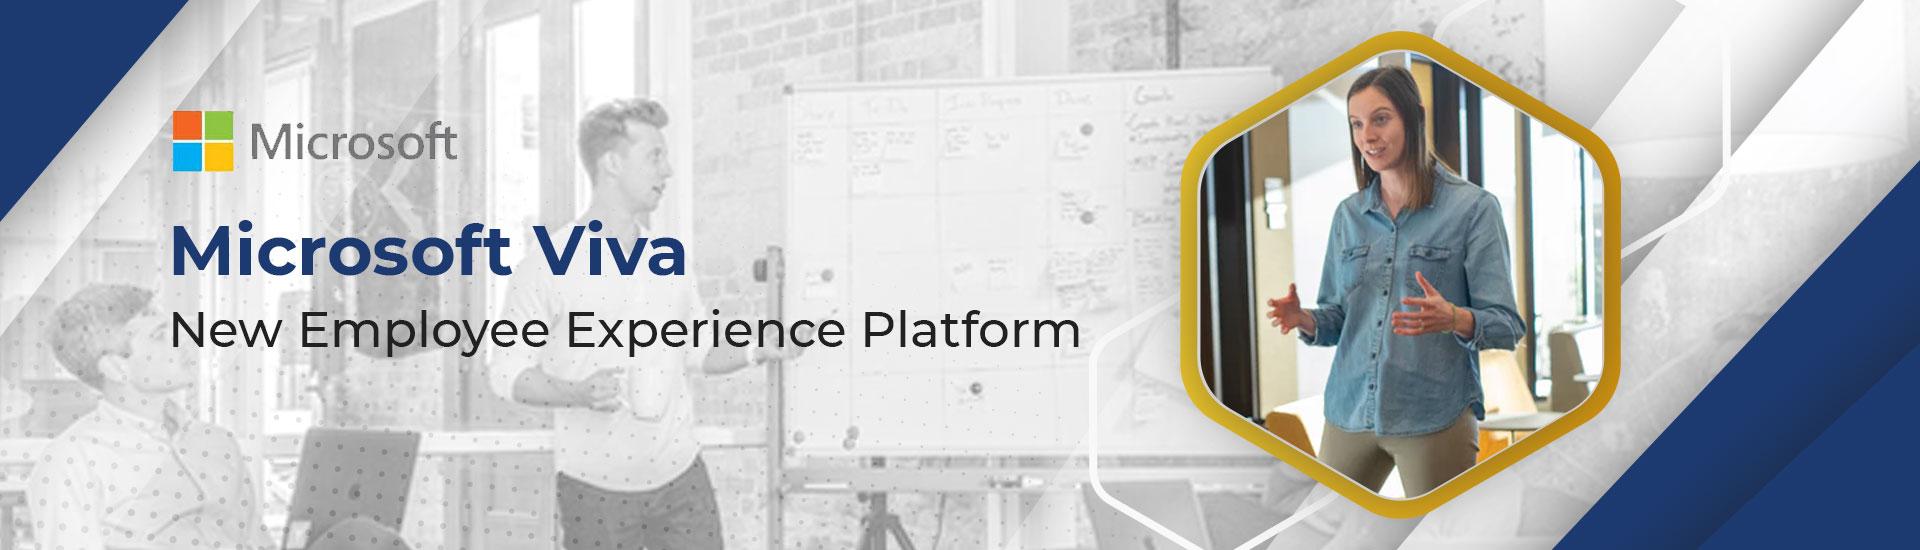 Microsoft Viva- New Employee Experience Platform